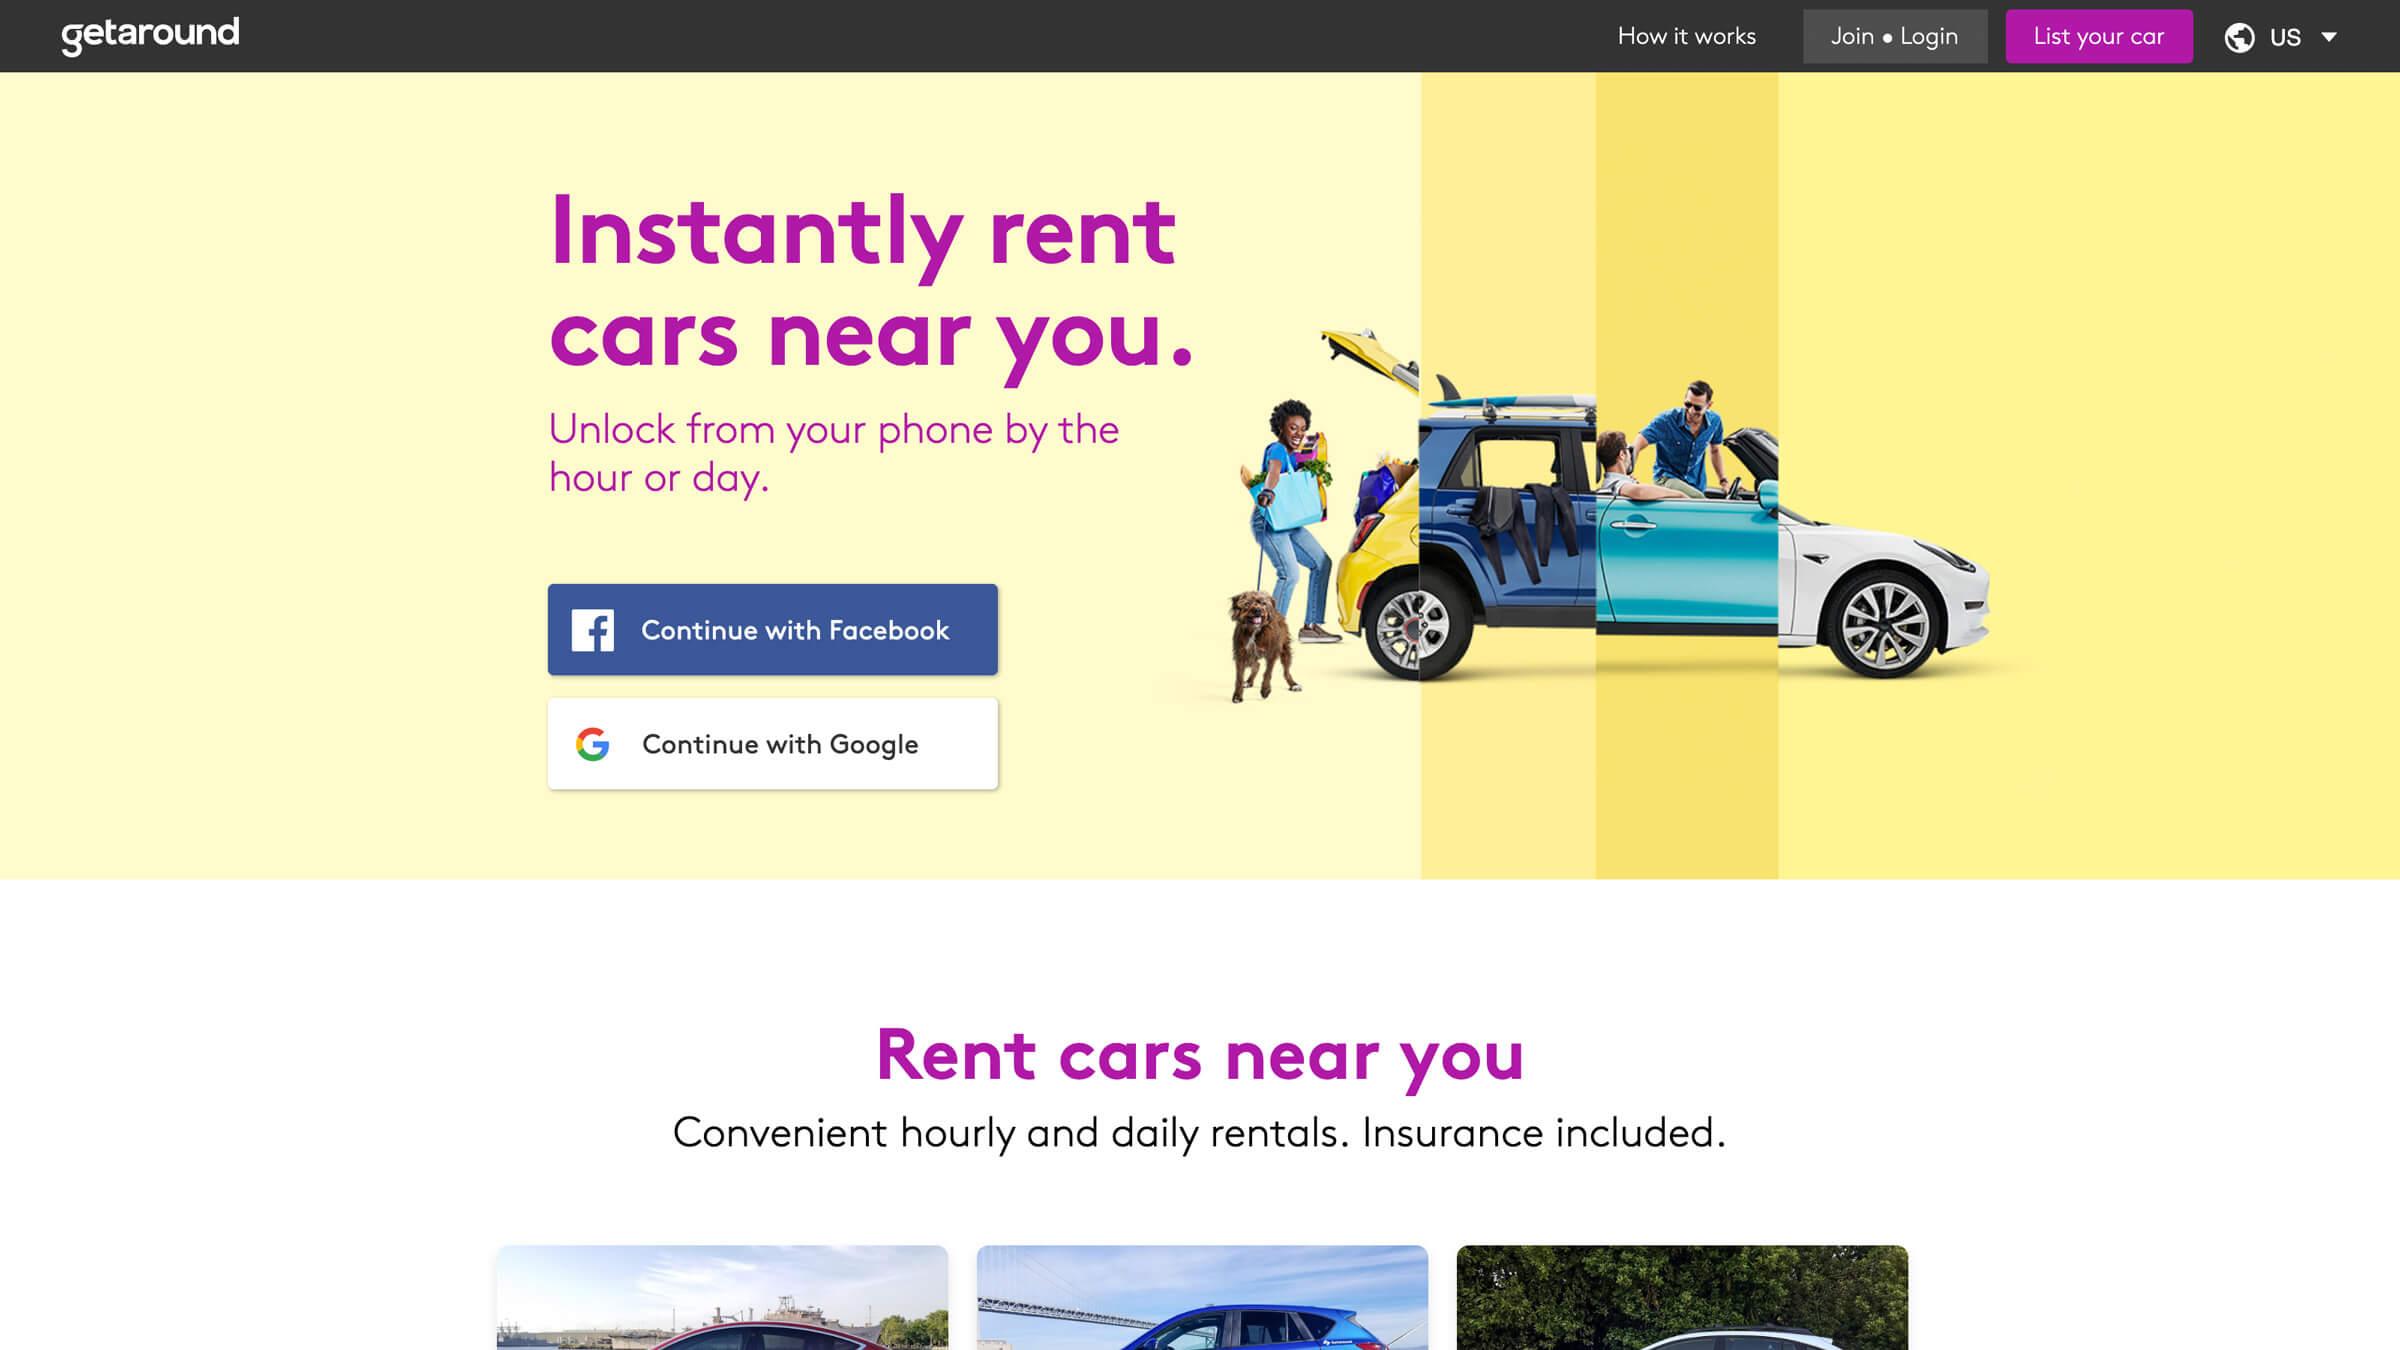 Getaround's home page